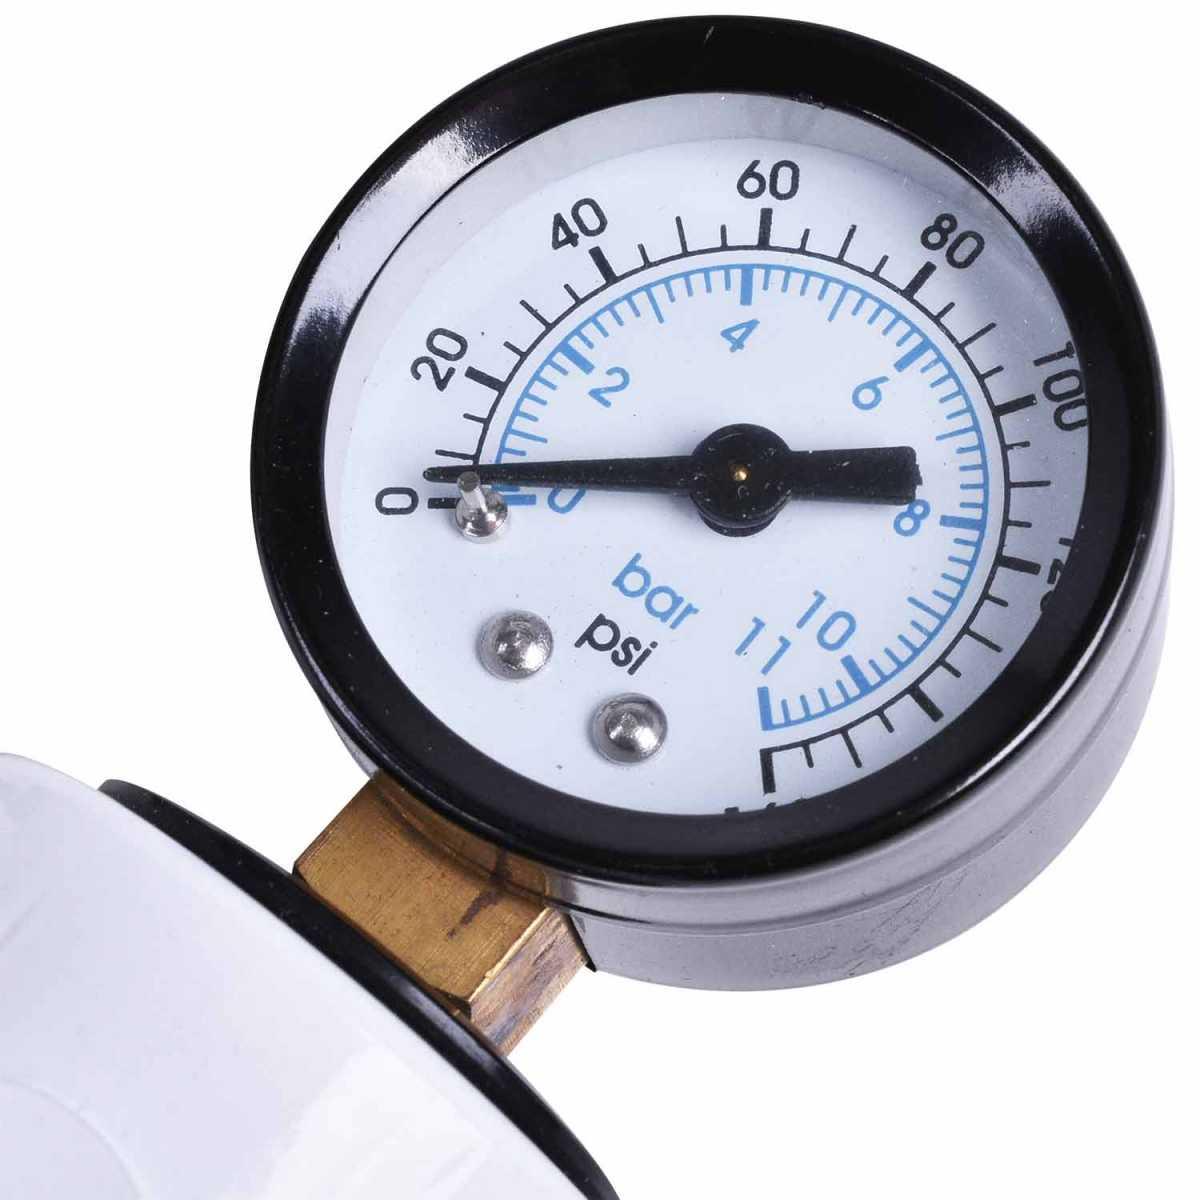 "Filtro Regulador de Ar Odontológico Quadruplo Mini 1/4"" Cj041-M Pressure"